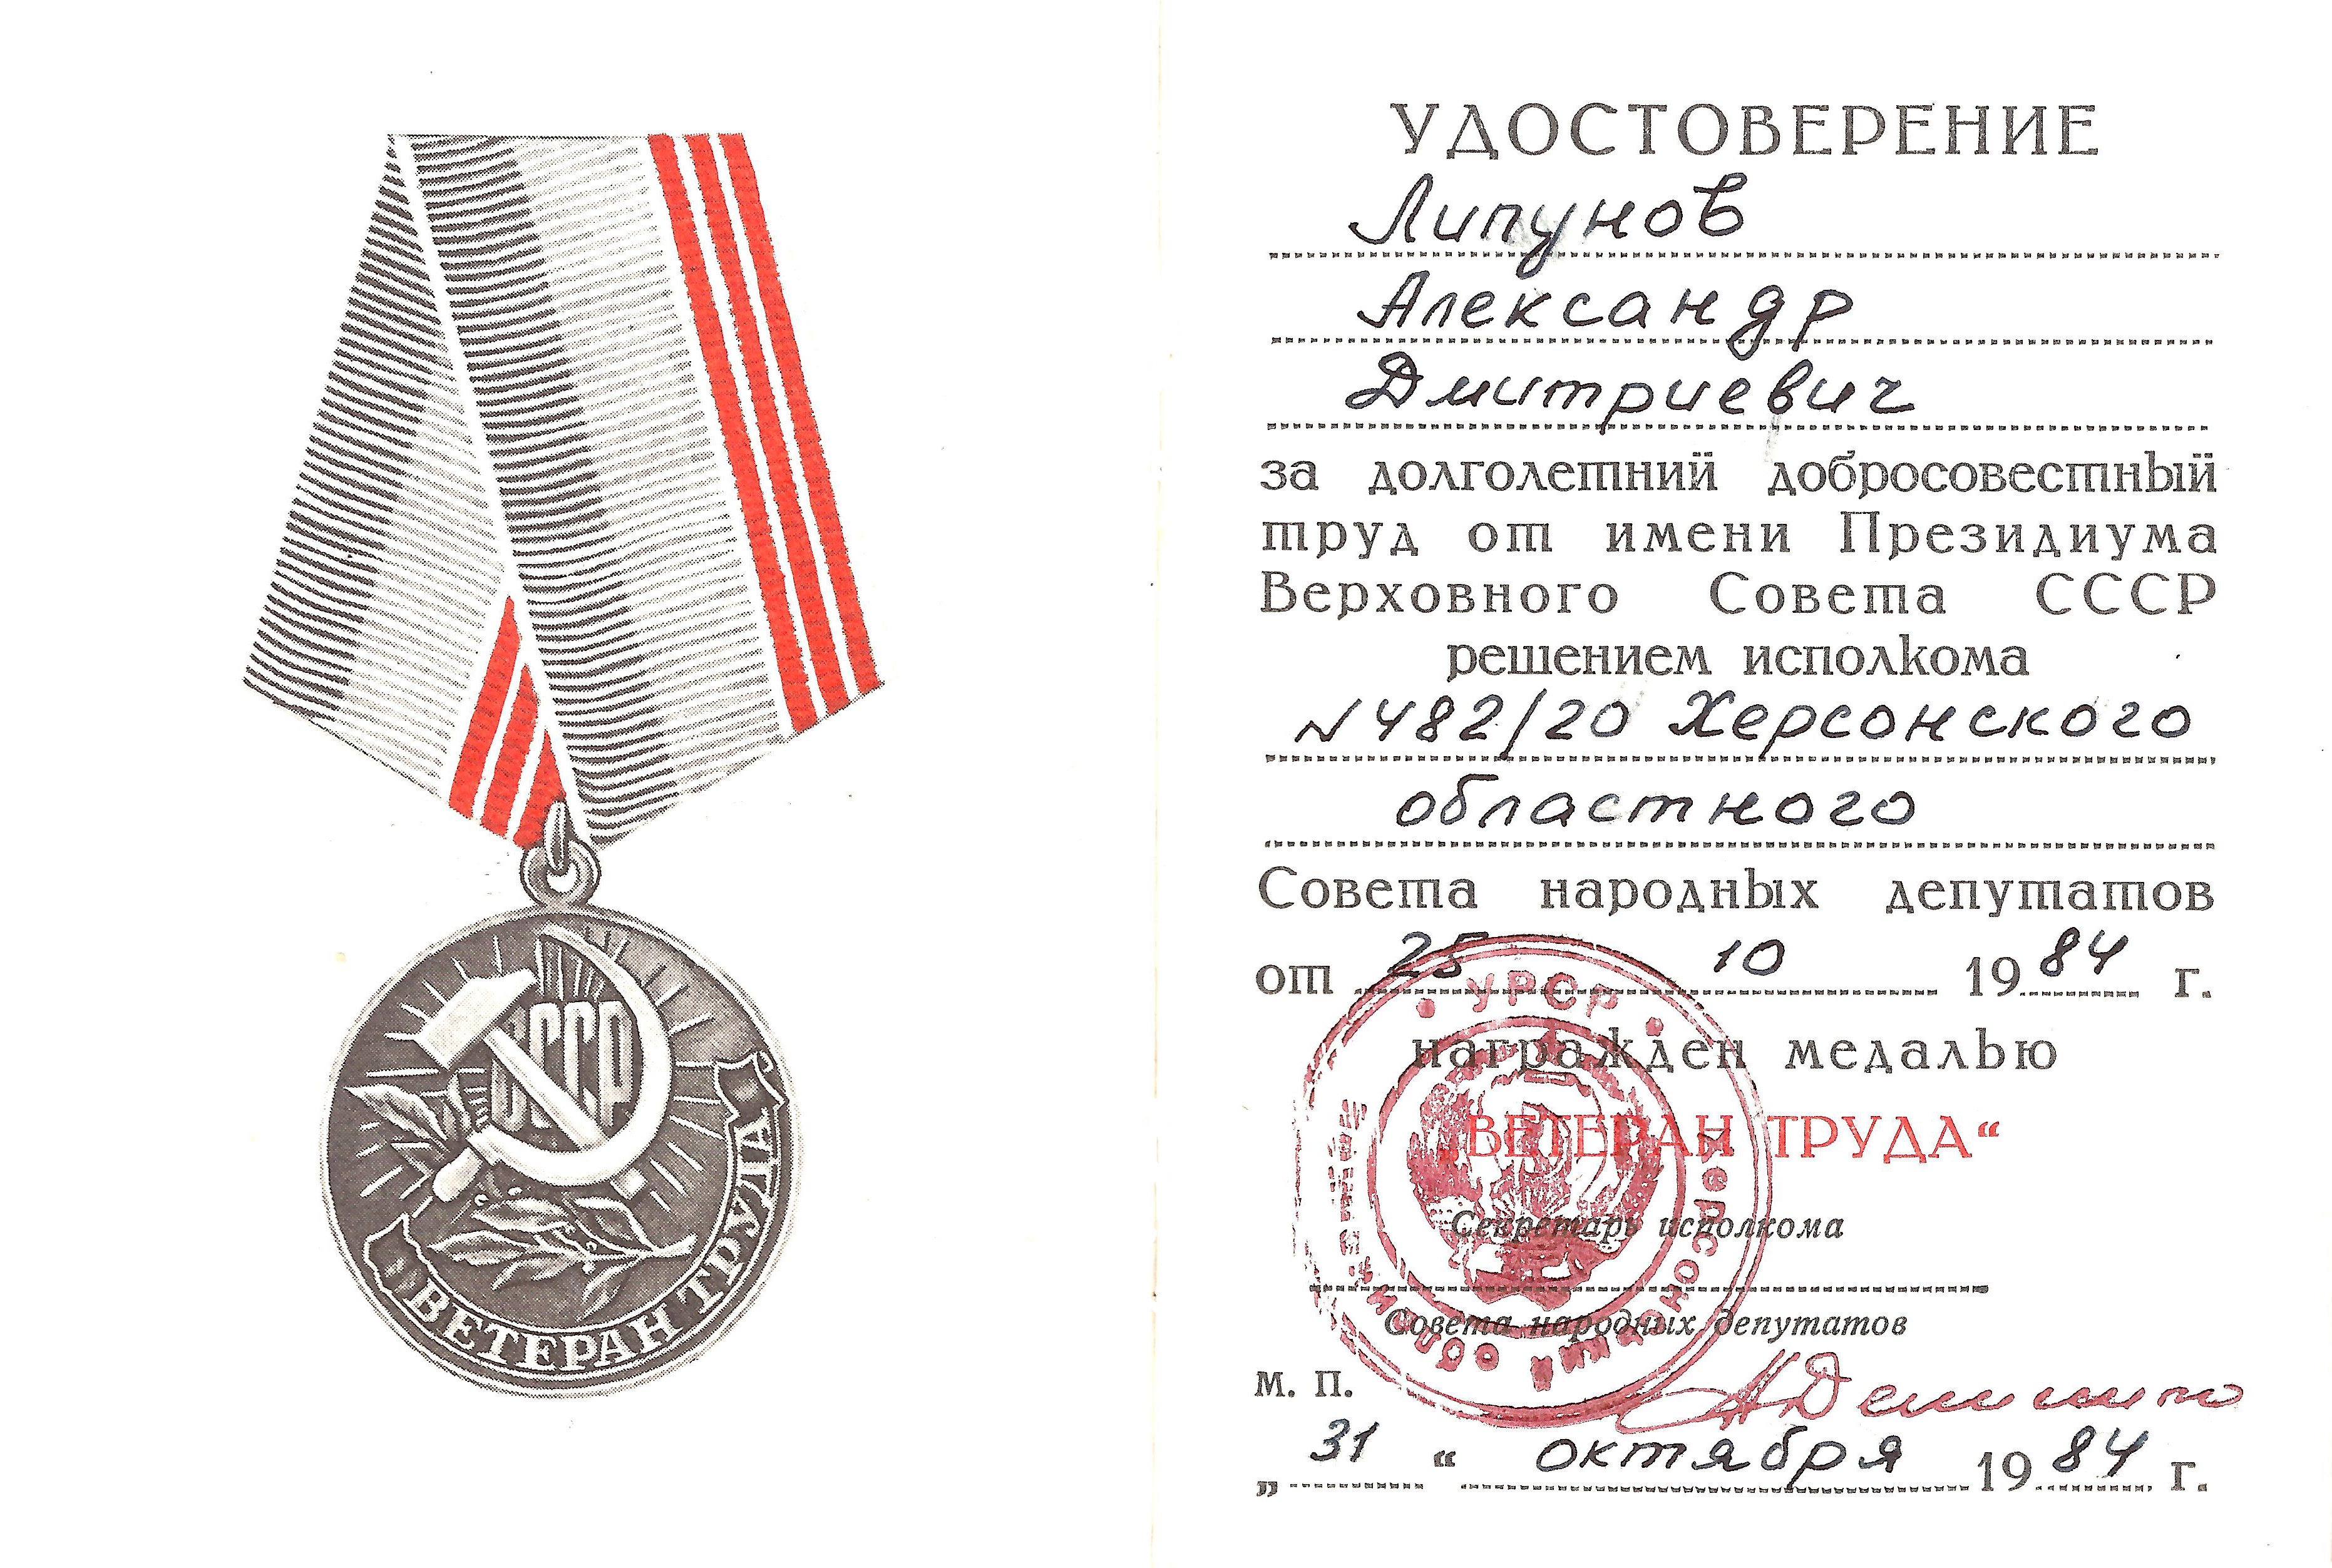 Медаль Ветерана труда образца 1974 года